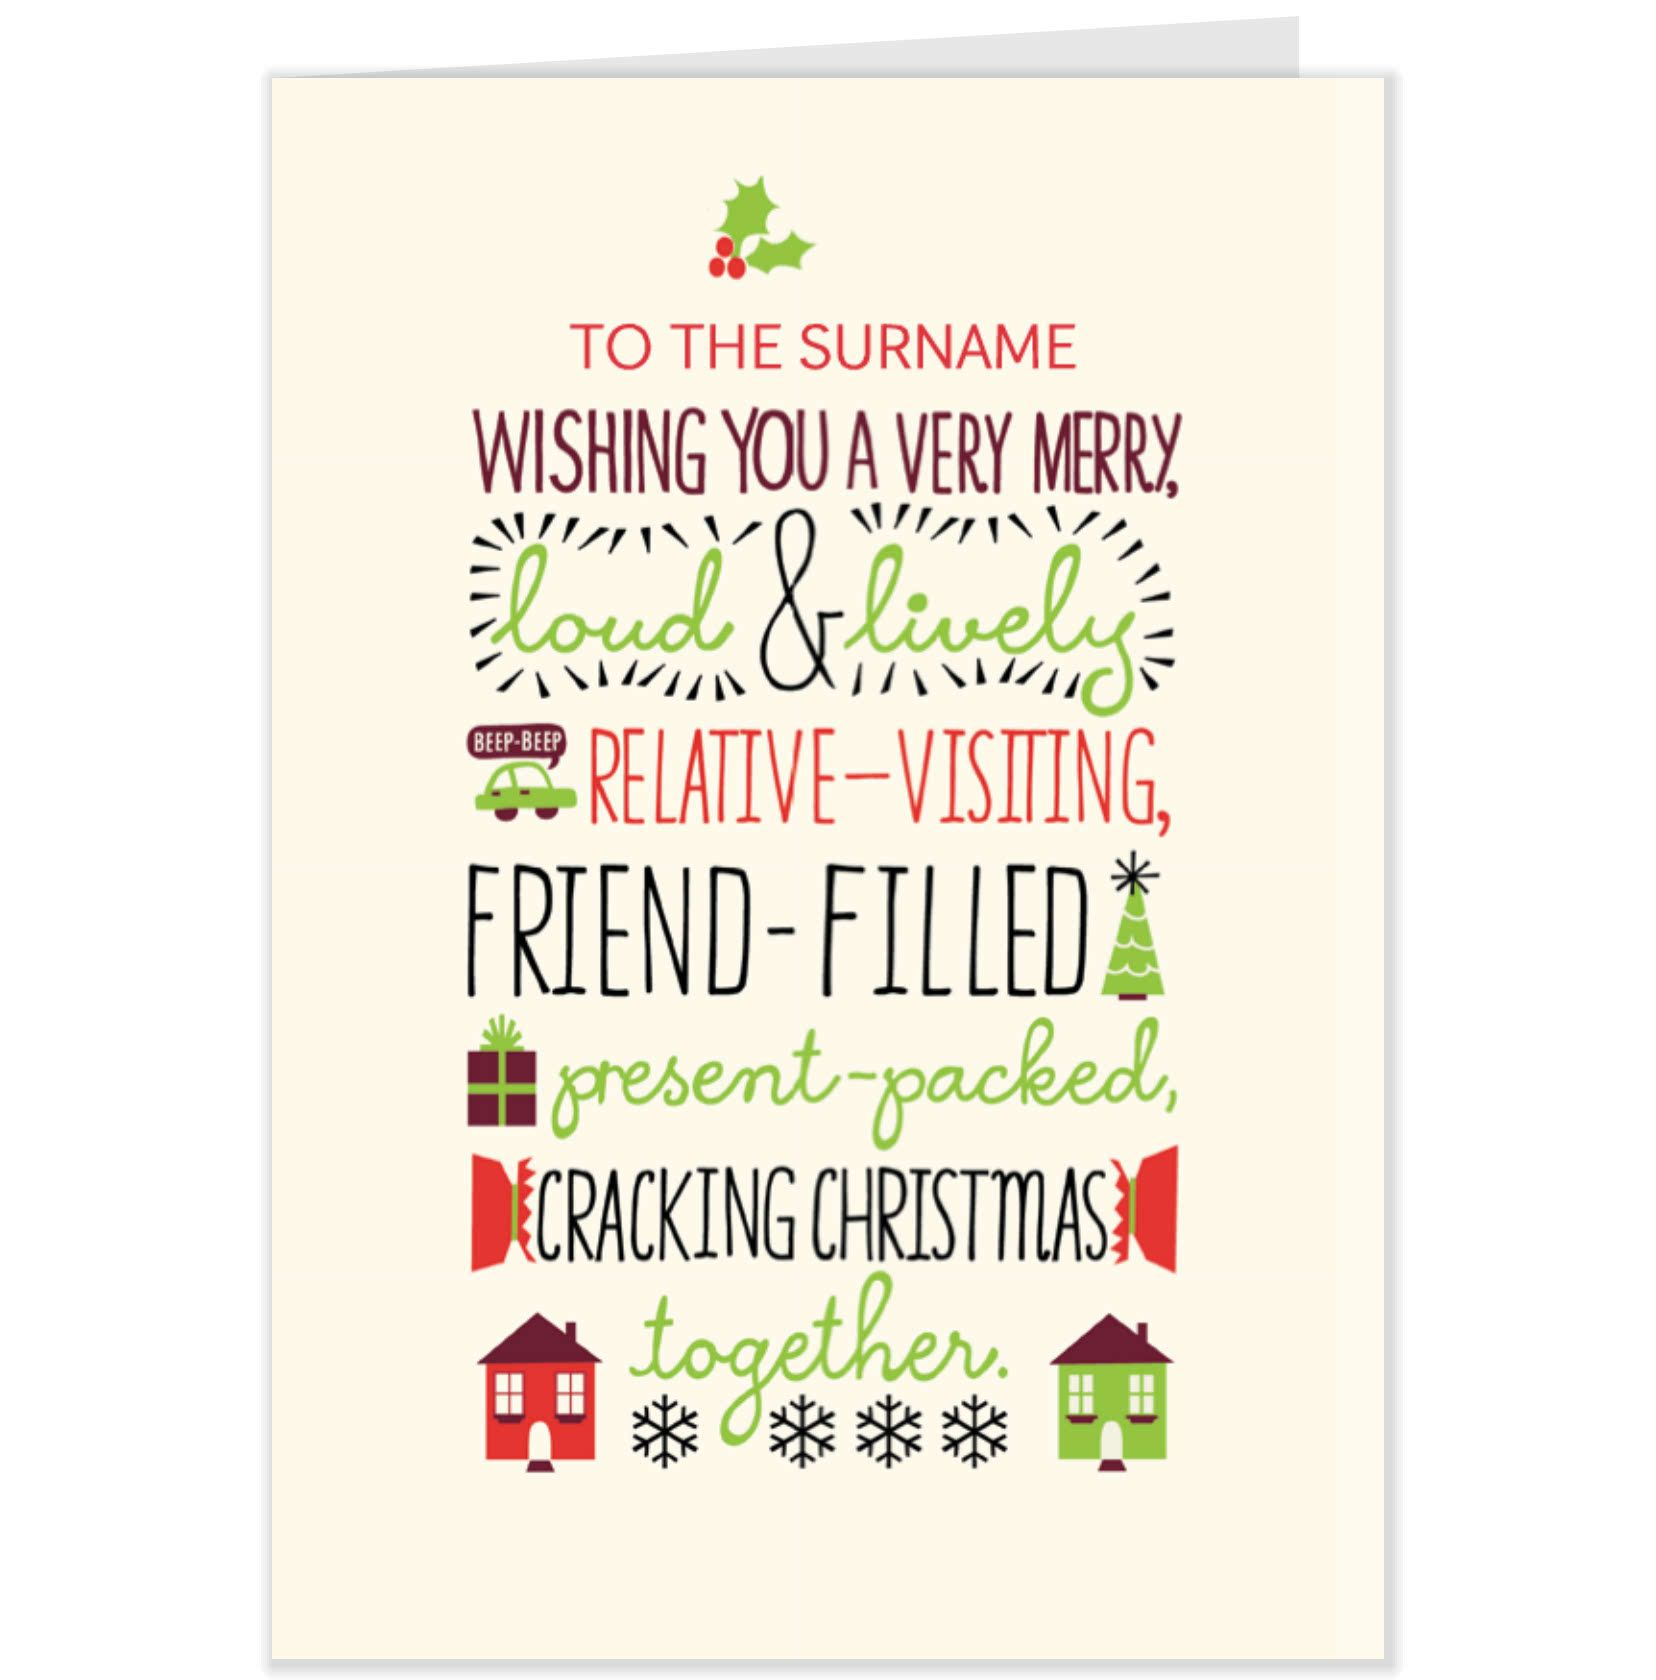 Shop Hallmark cards, Hallmark greeting cards, Lettering